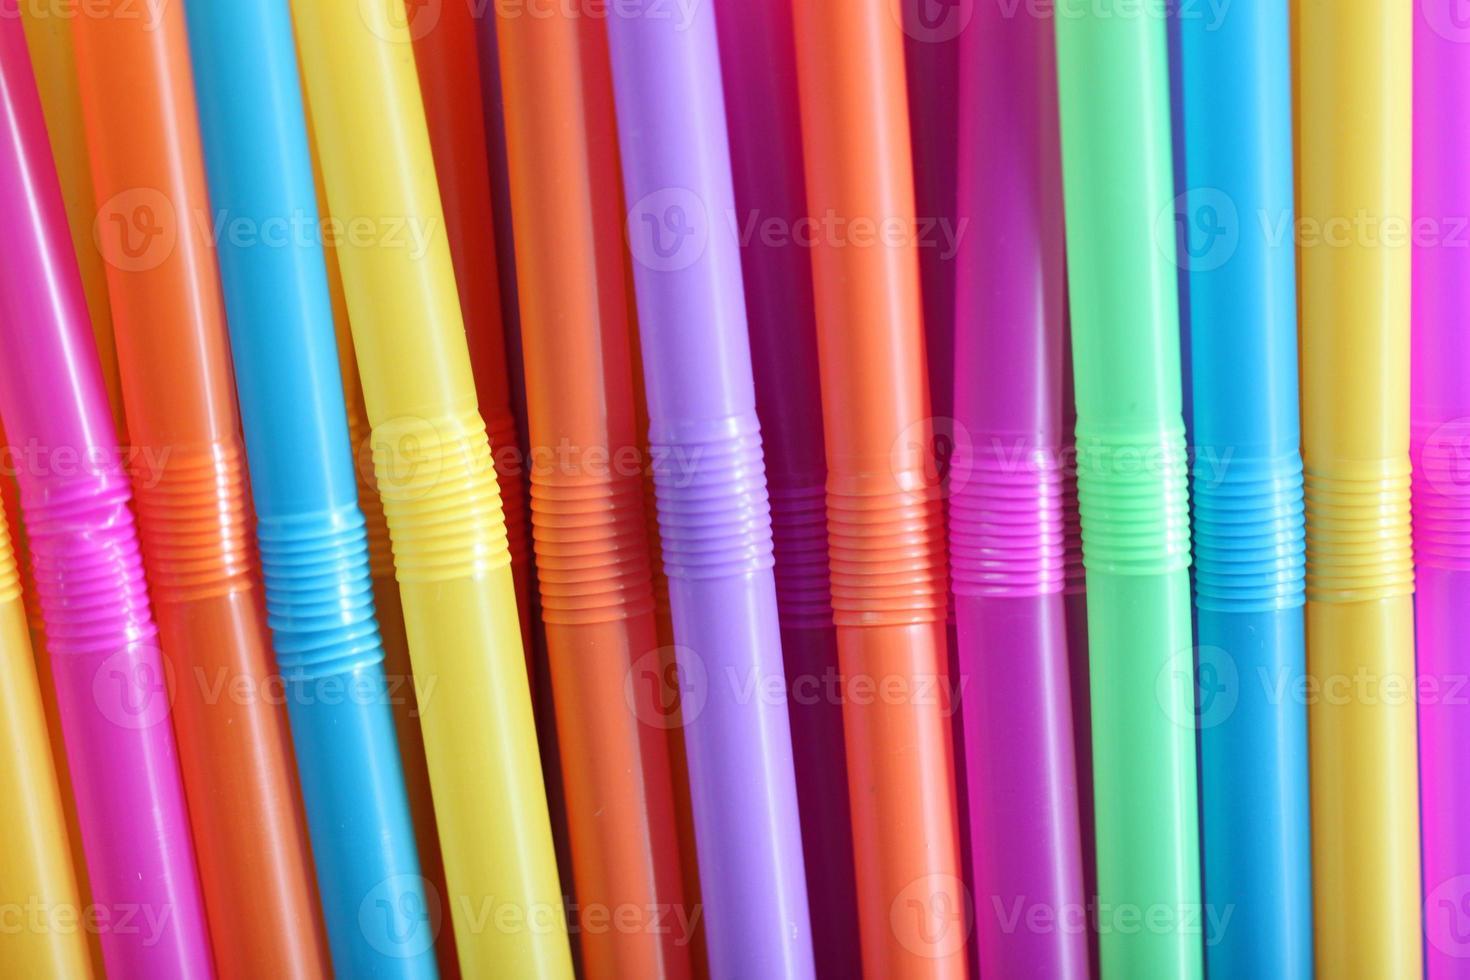 färgglada dricka sugrör. foto